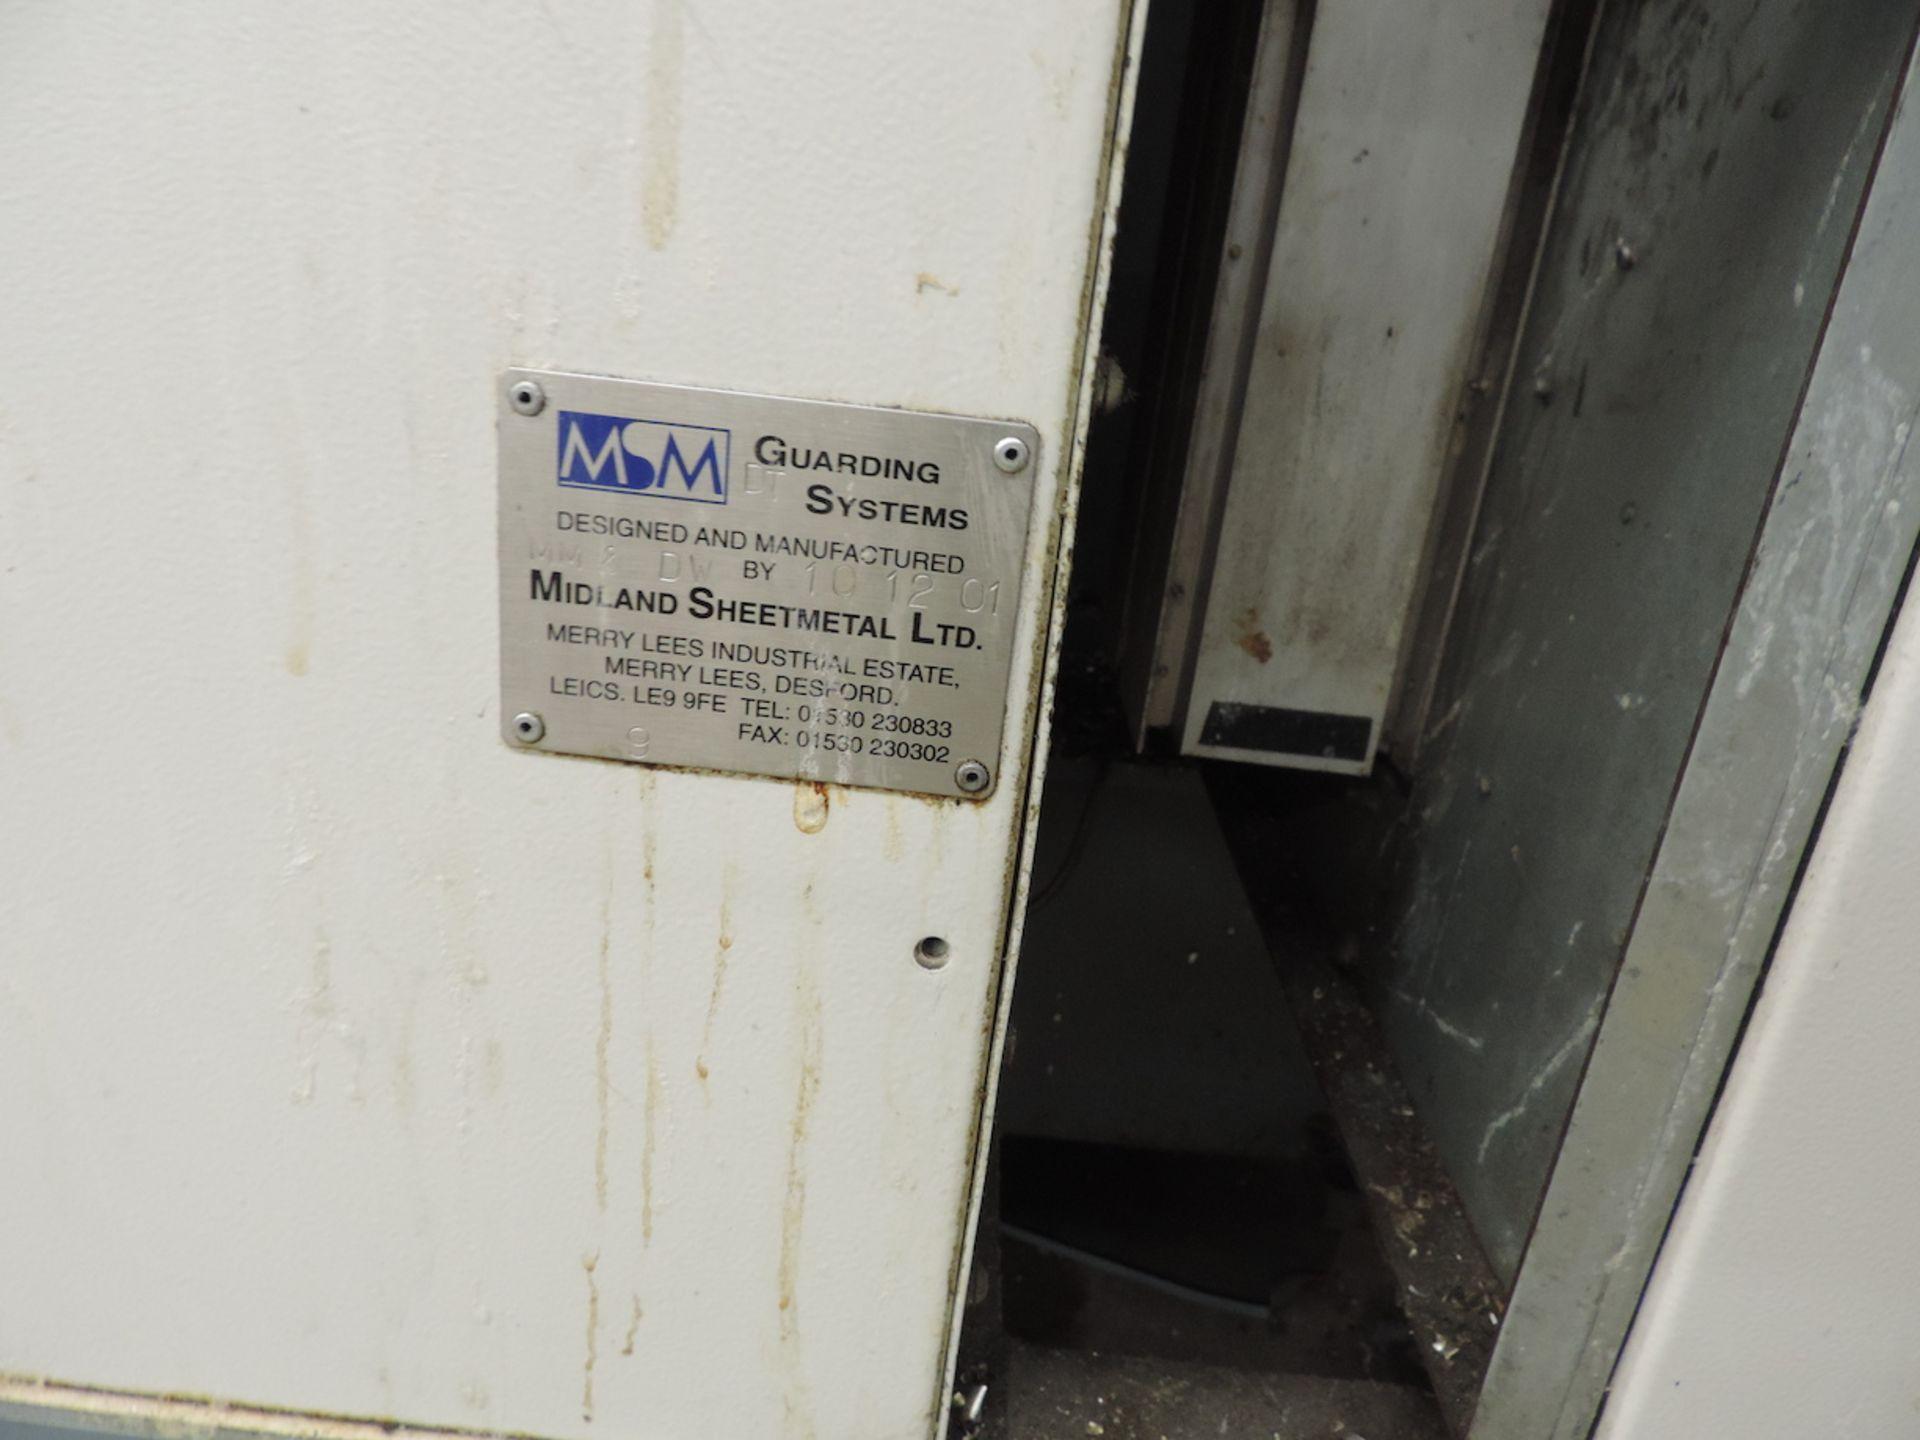 "CINCINNATI VCNC 500 VMC, F00-K10010 GE FANUC 21 I-MB CONTROL, XYZ TRAVELS: 20"" X 20"" X 20"" , 27"" X - Image 12 of 13"